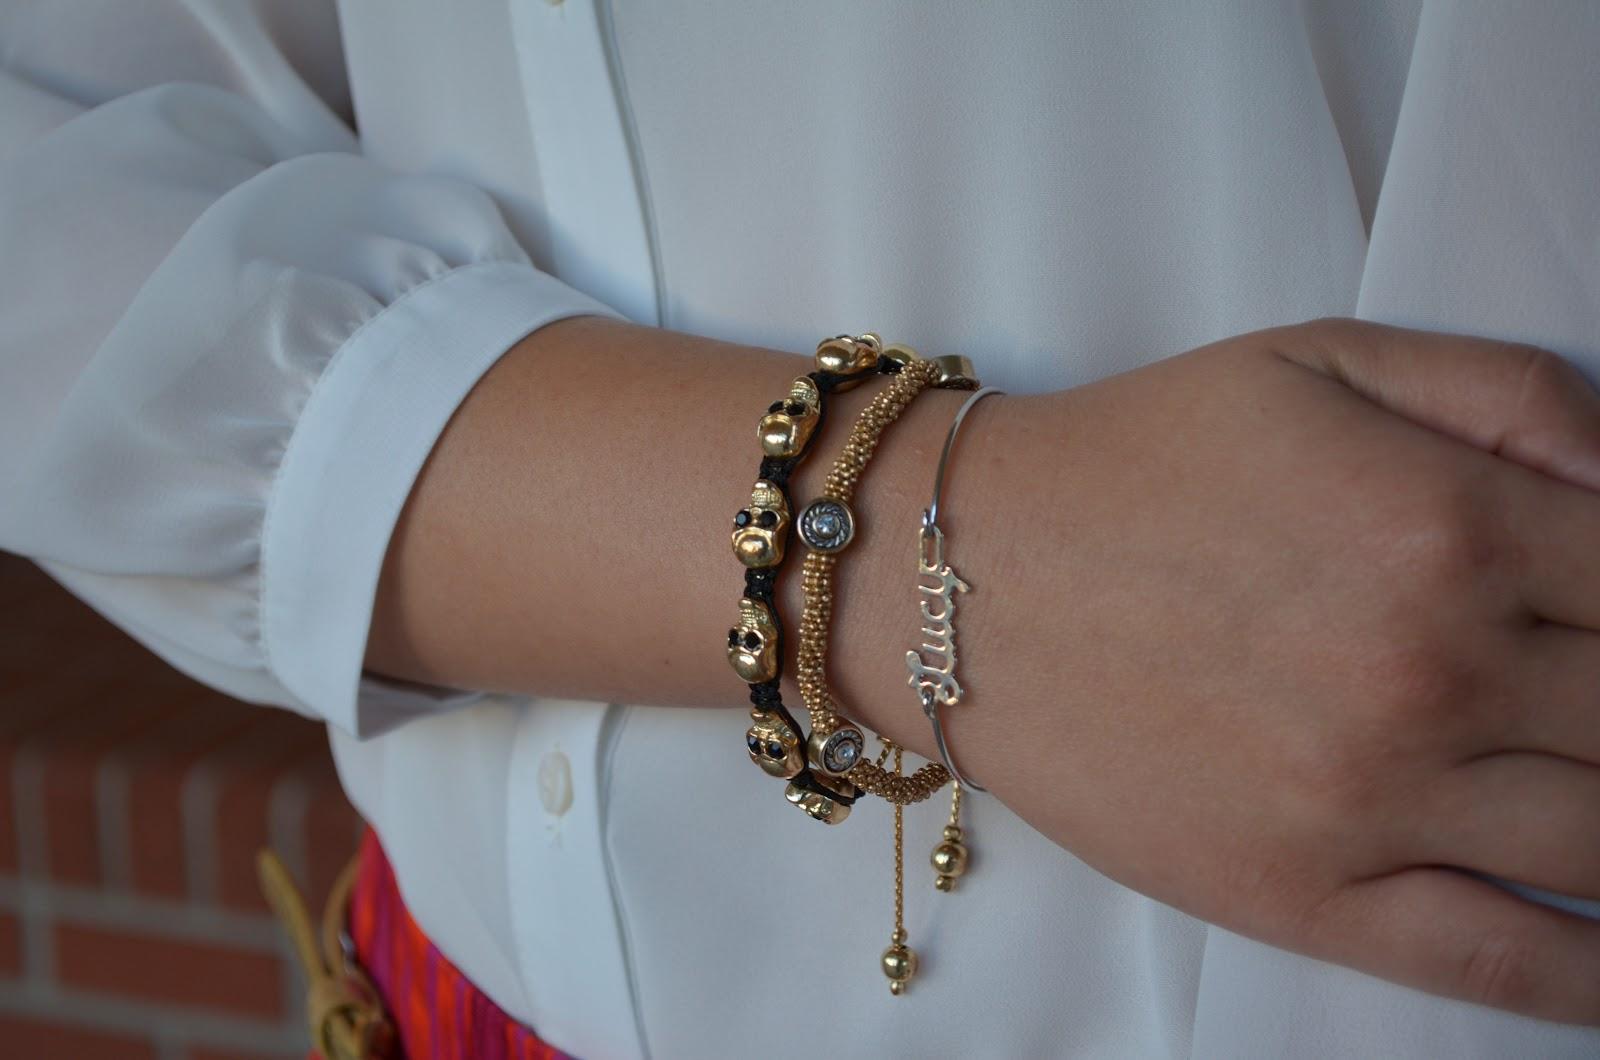 diamentdesigns, diament designs, etsy, lucy, lucy bracelet, skull, skull bracelet, gold, gold jewelry, gold bracelet